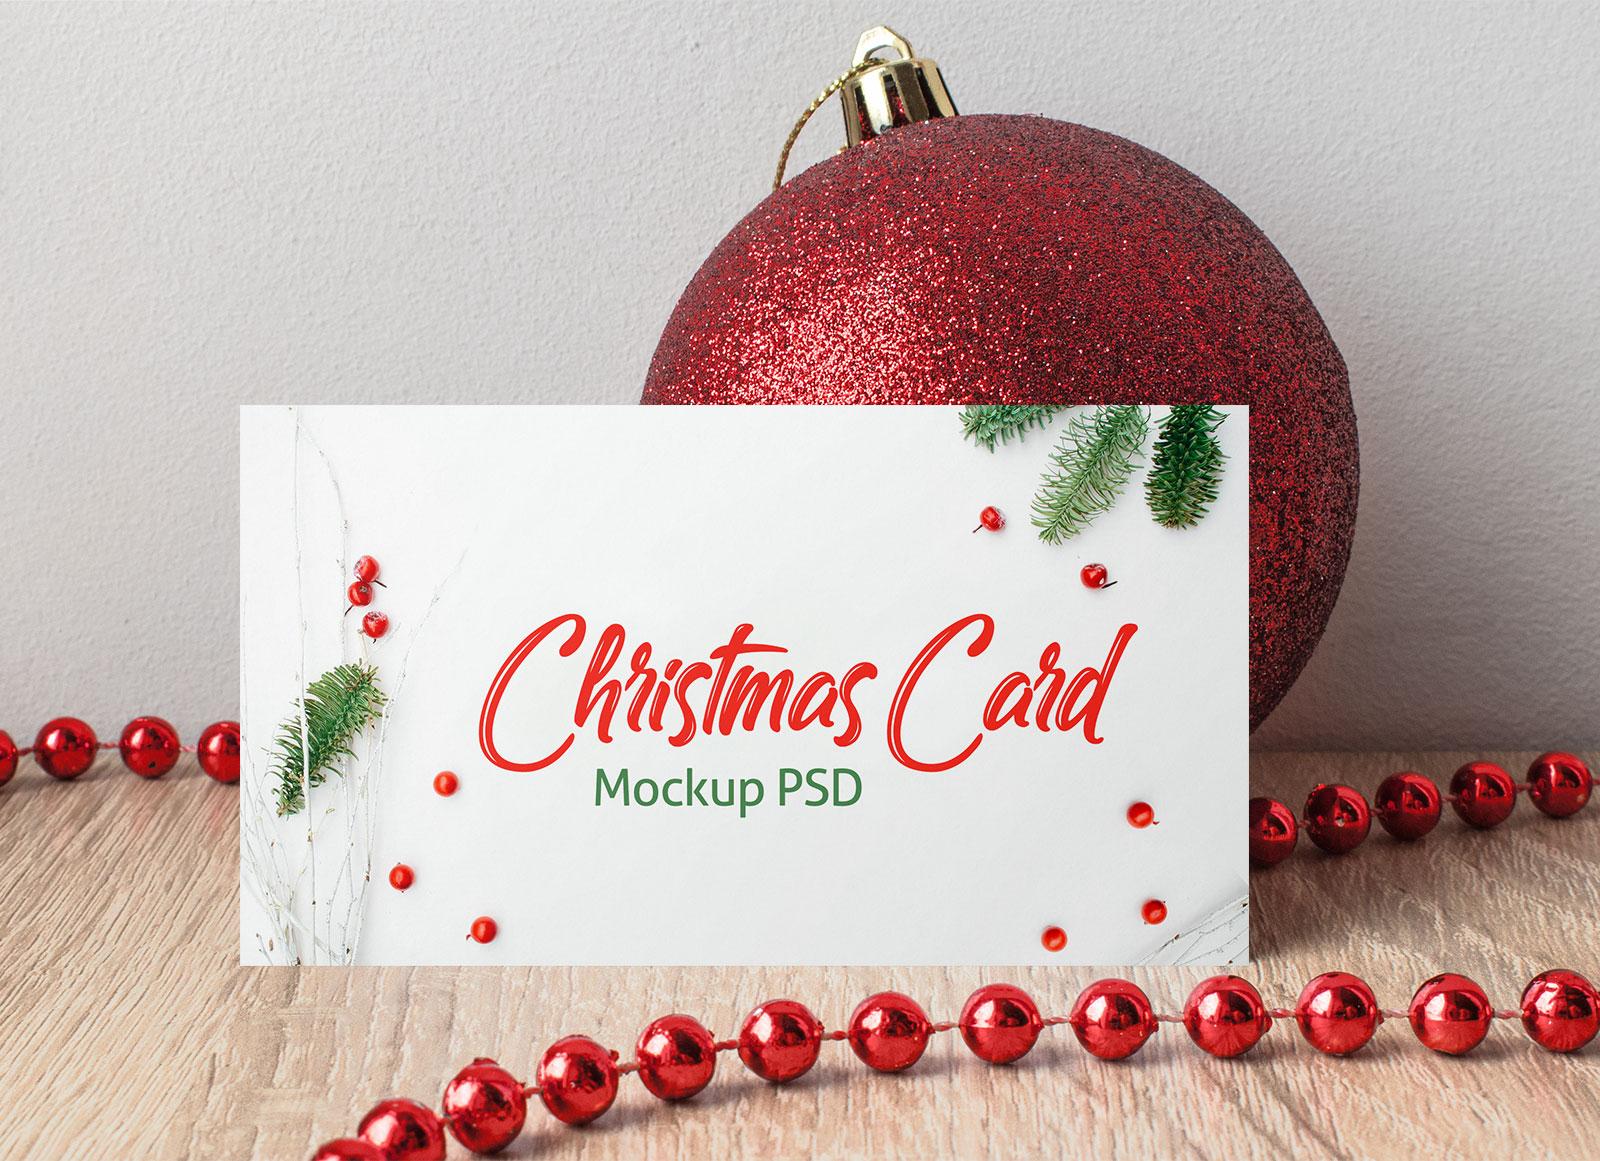 Free-Horizontal-Christmas-Card-Mockup-PSD